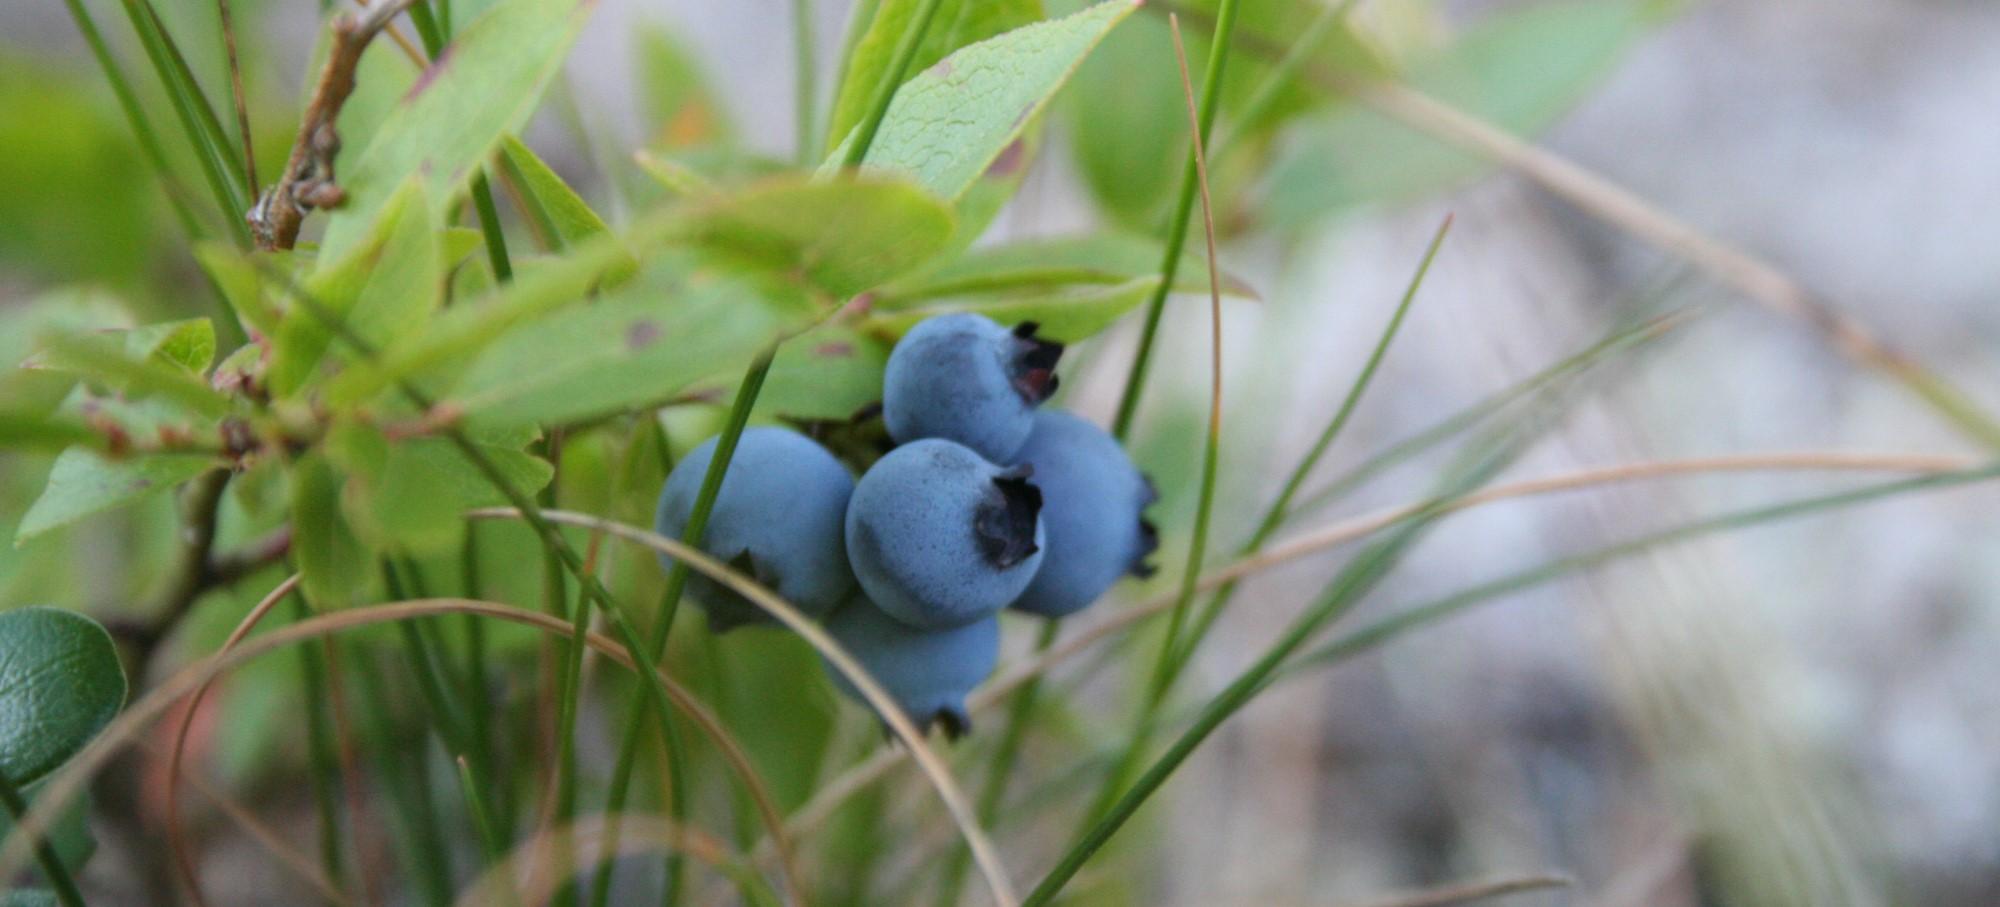 5 Popular Edible Berries & Plants in British Columbia